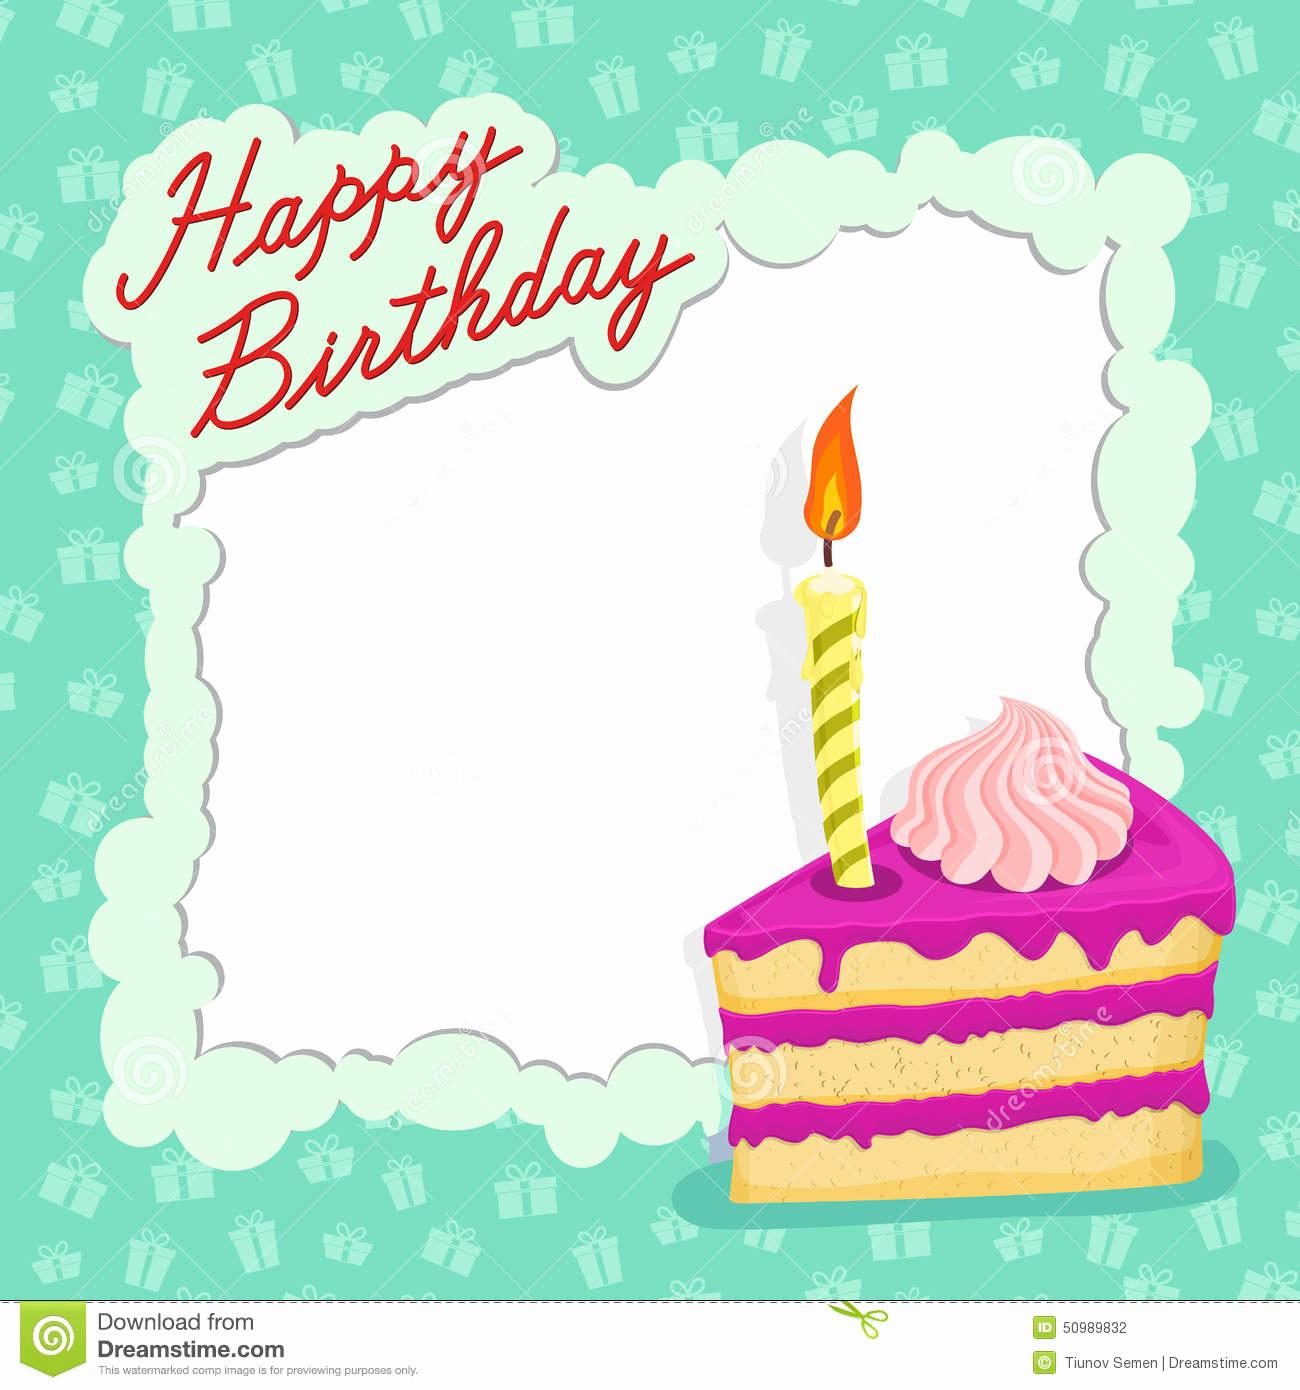 Happy Birthday Card Template New Happy Birthday Cake Card Stock Vector Illustration Of